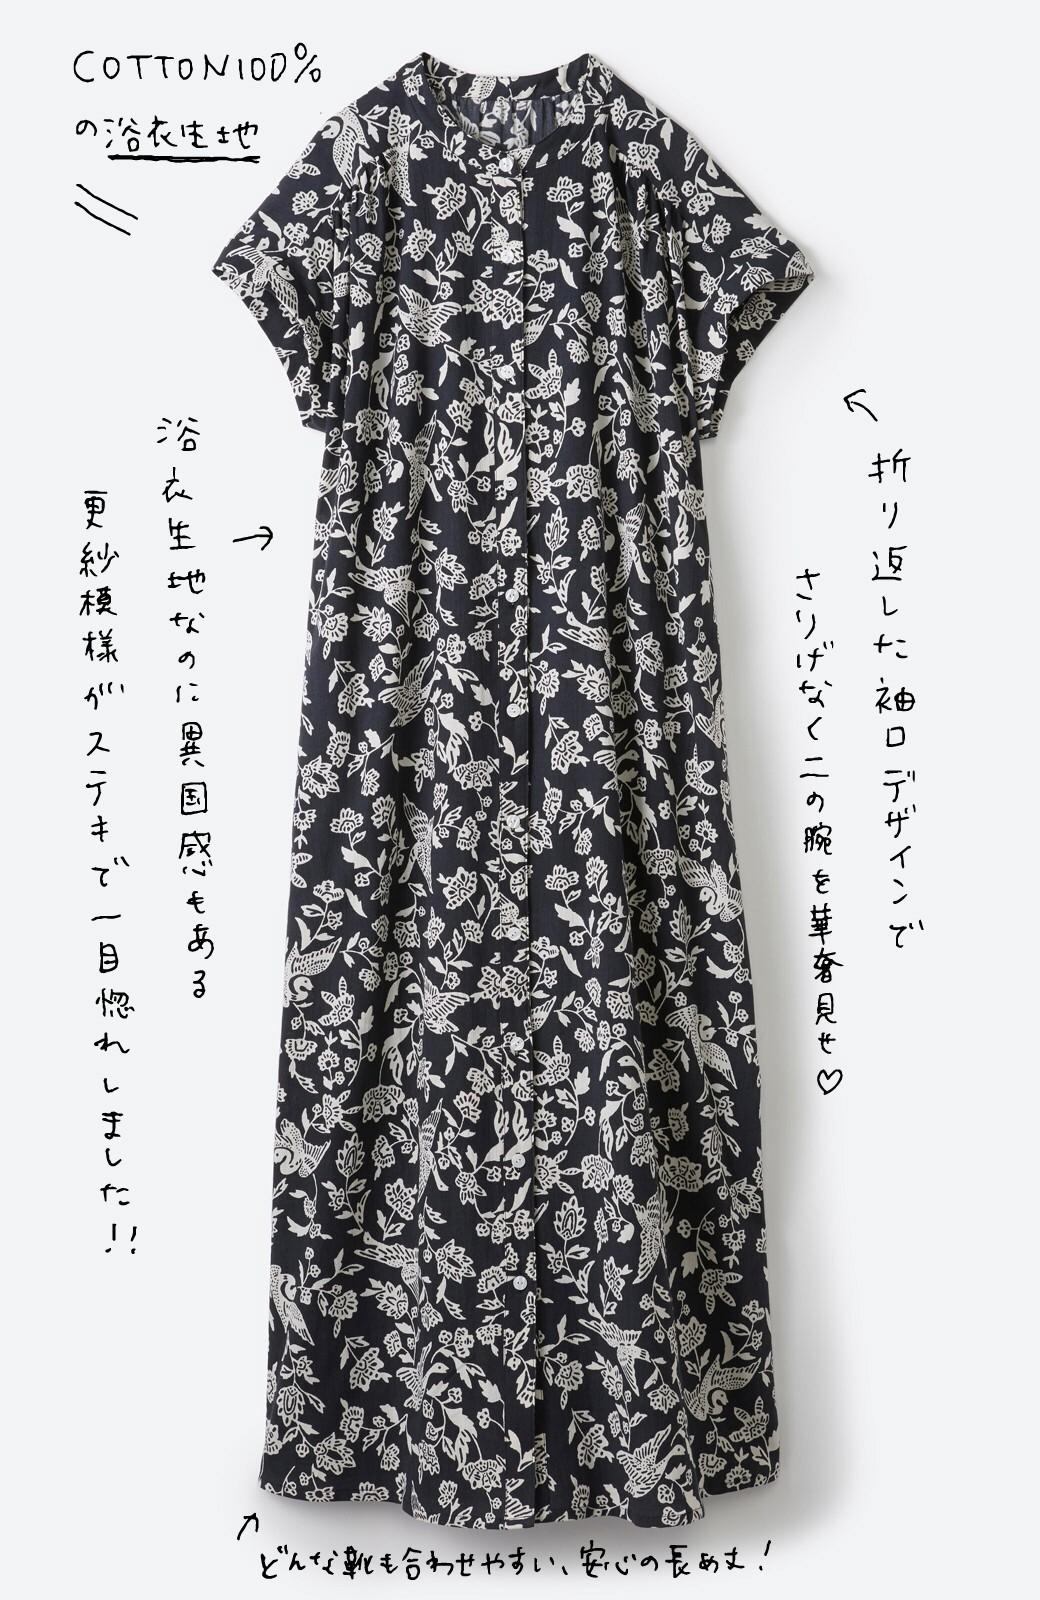 haco! 京都の浴衣屋さんと作った浴衣生地の羽織ってもかわいいロングワンピース <ブラック系その他>の商品写真2